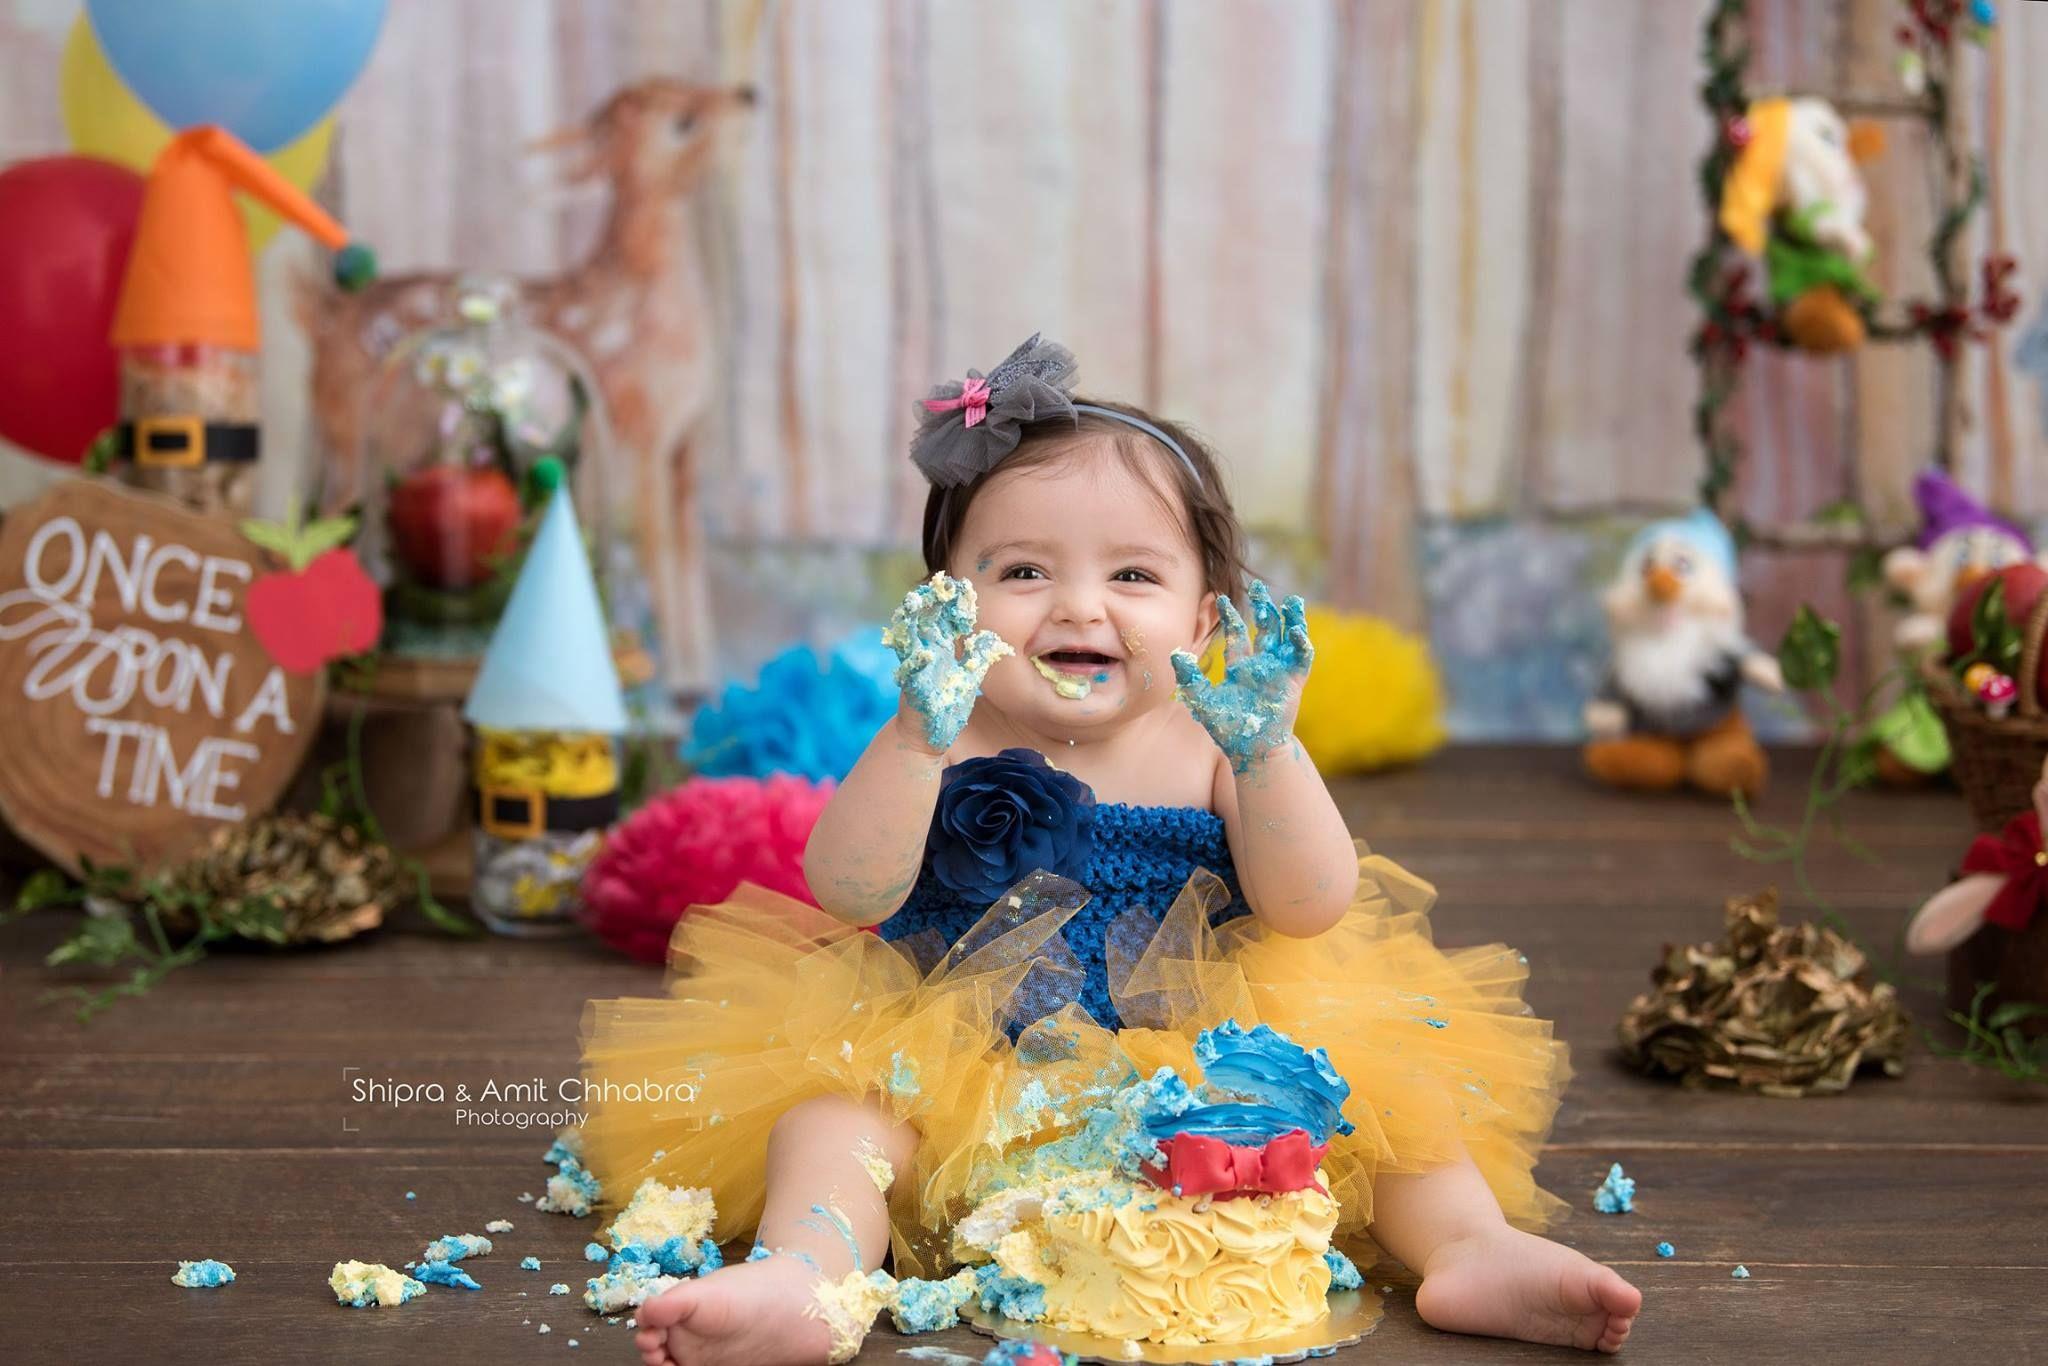 Photoshoot Packages Shipra Amit Chhabra Photography Smash Cake Photo Props Snow White Birthday Party Smash Cake Girl